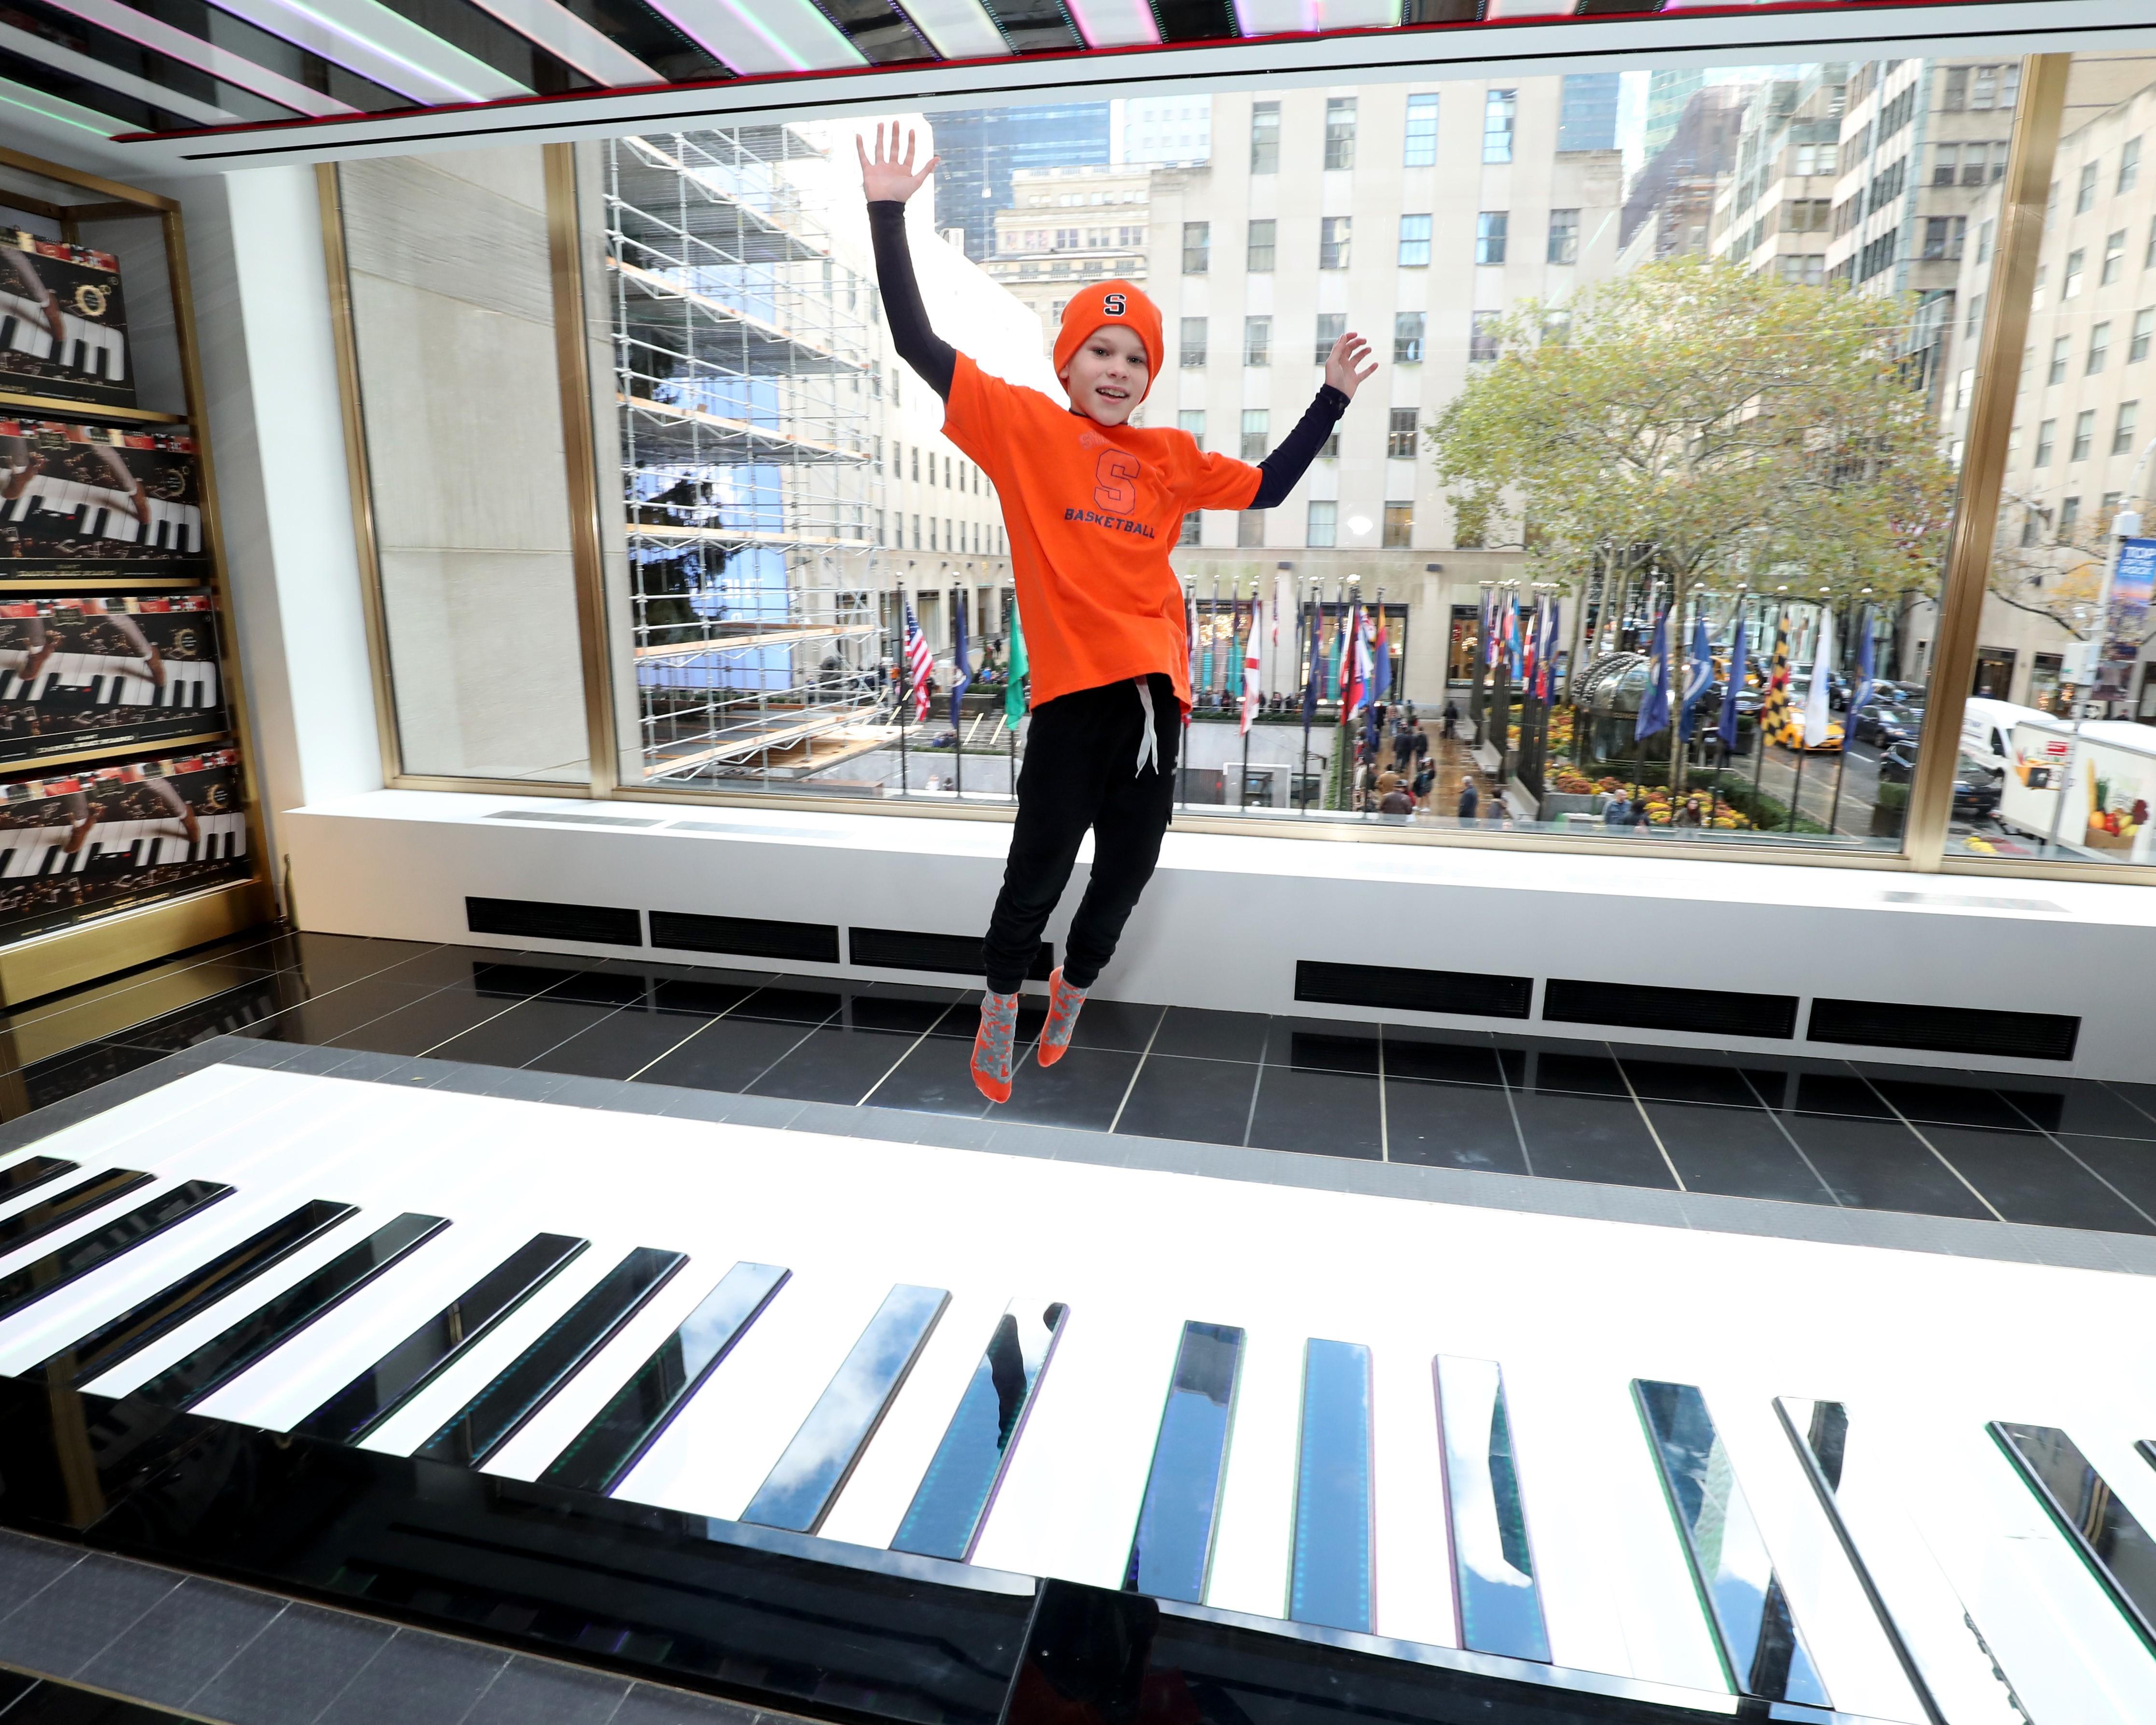 Piano do FAO Schwarz (Foto: Getty Images)